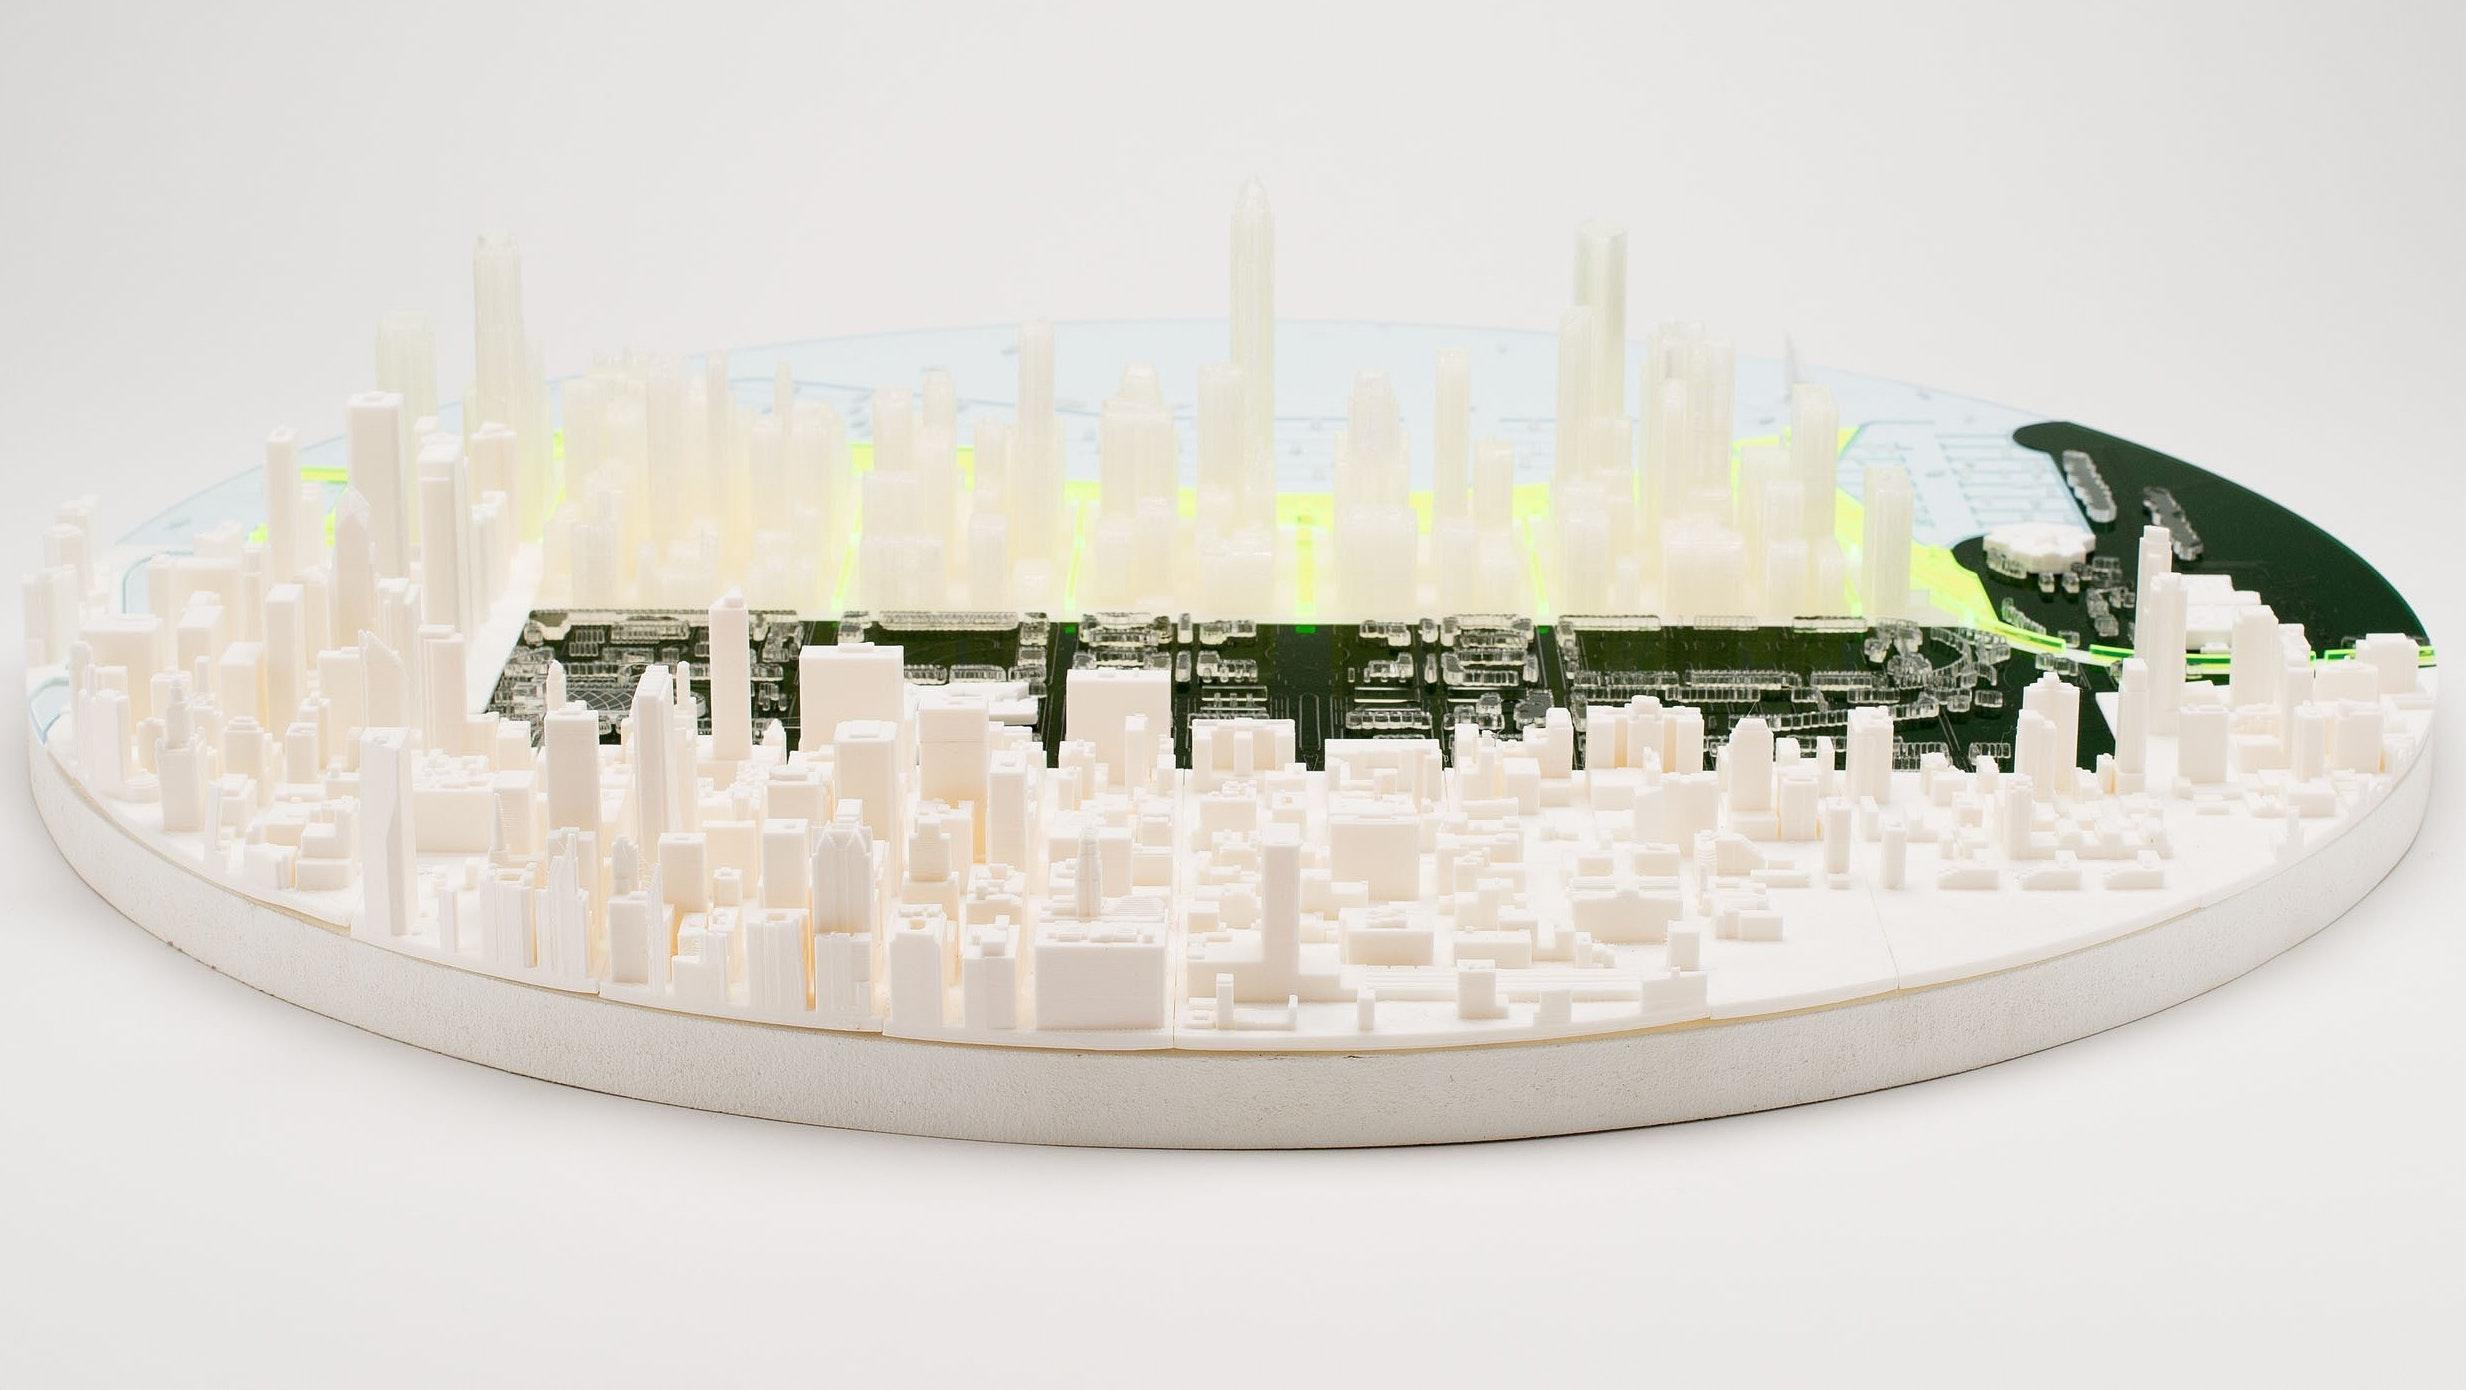 2015.624 The Big Shift Model Port Urbanism